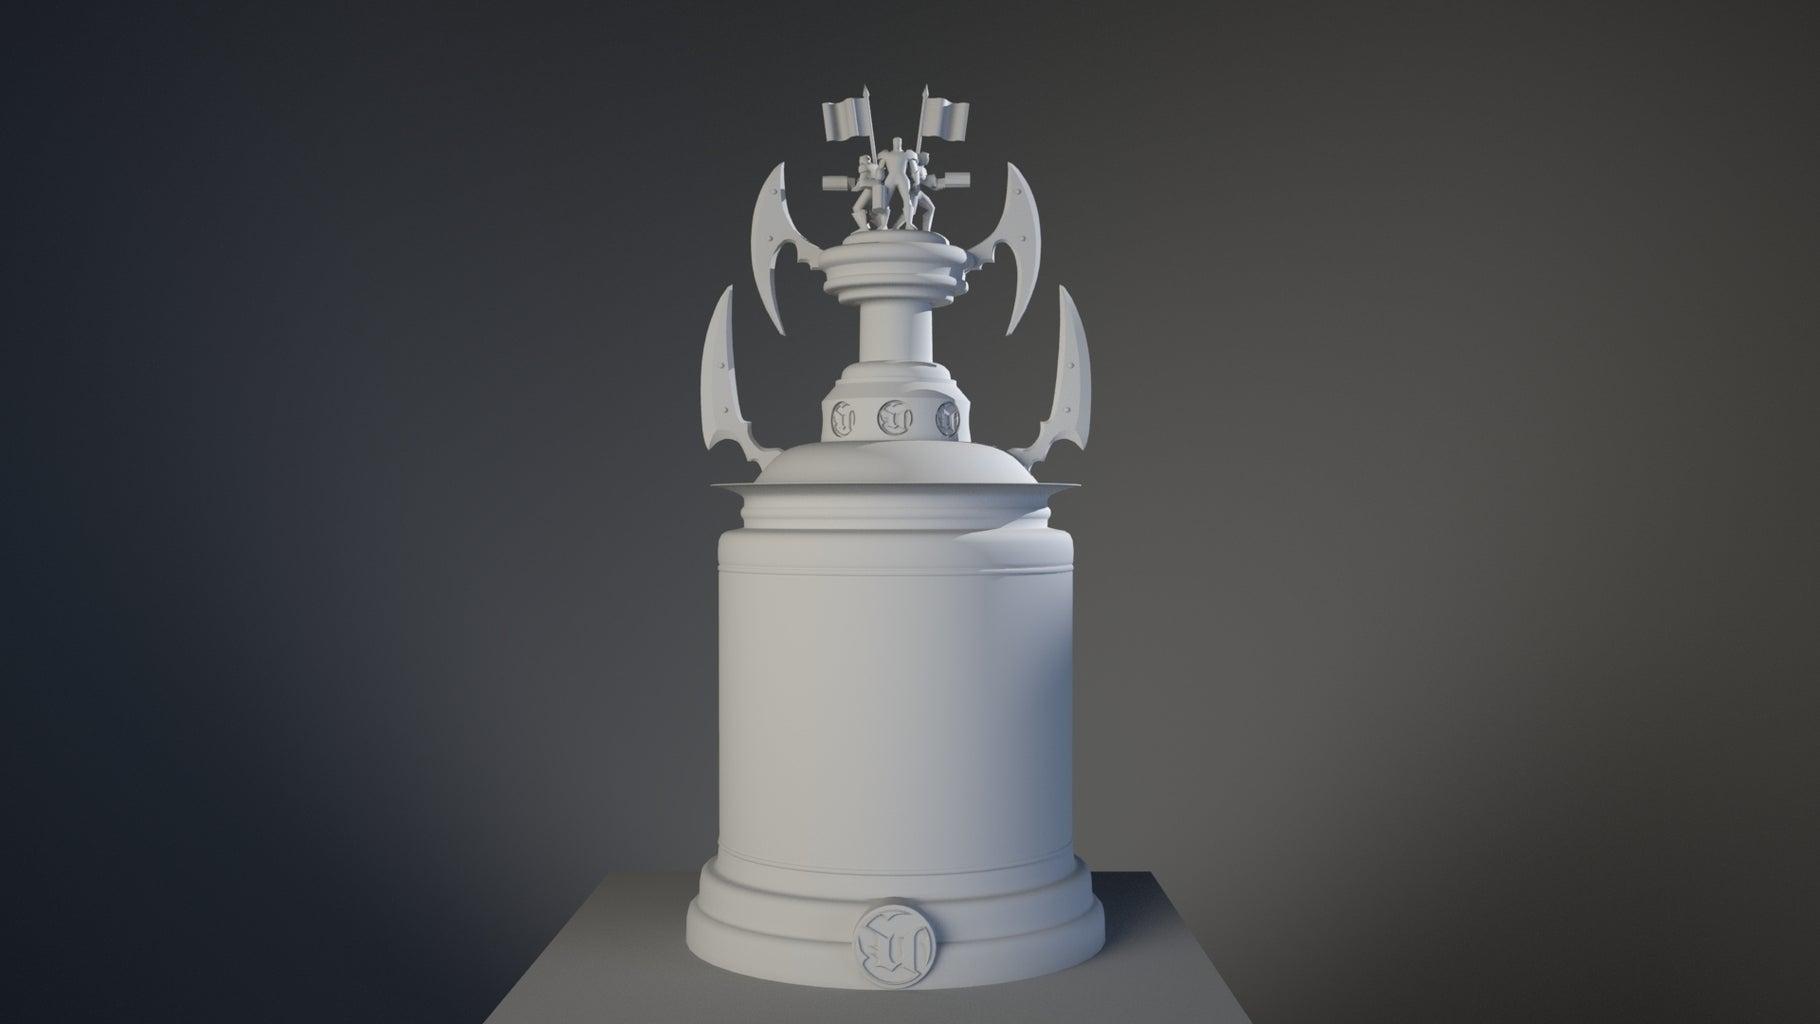 Update: 3D Model for 3D Printing